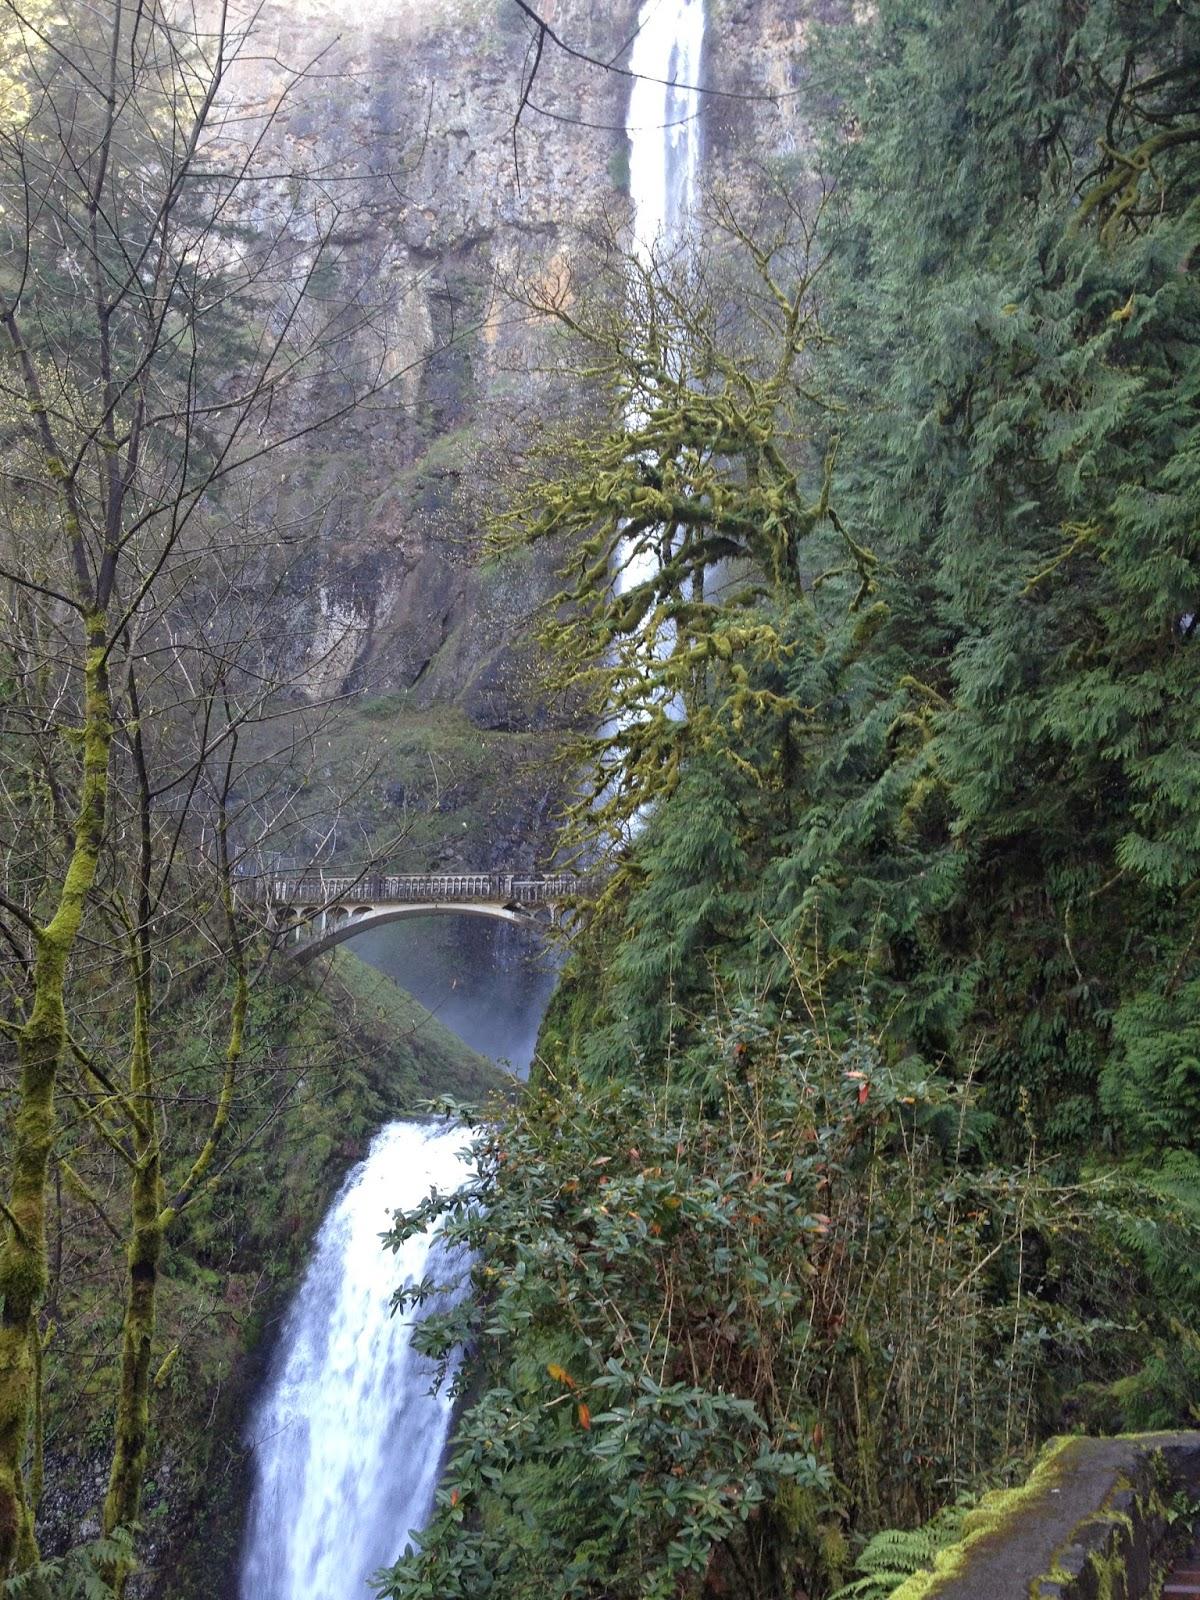 multnomah falls, waterfalls, bridge in front of waterfall, oregon waterfalls